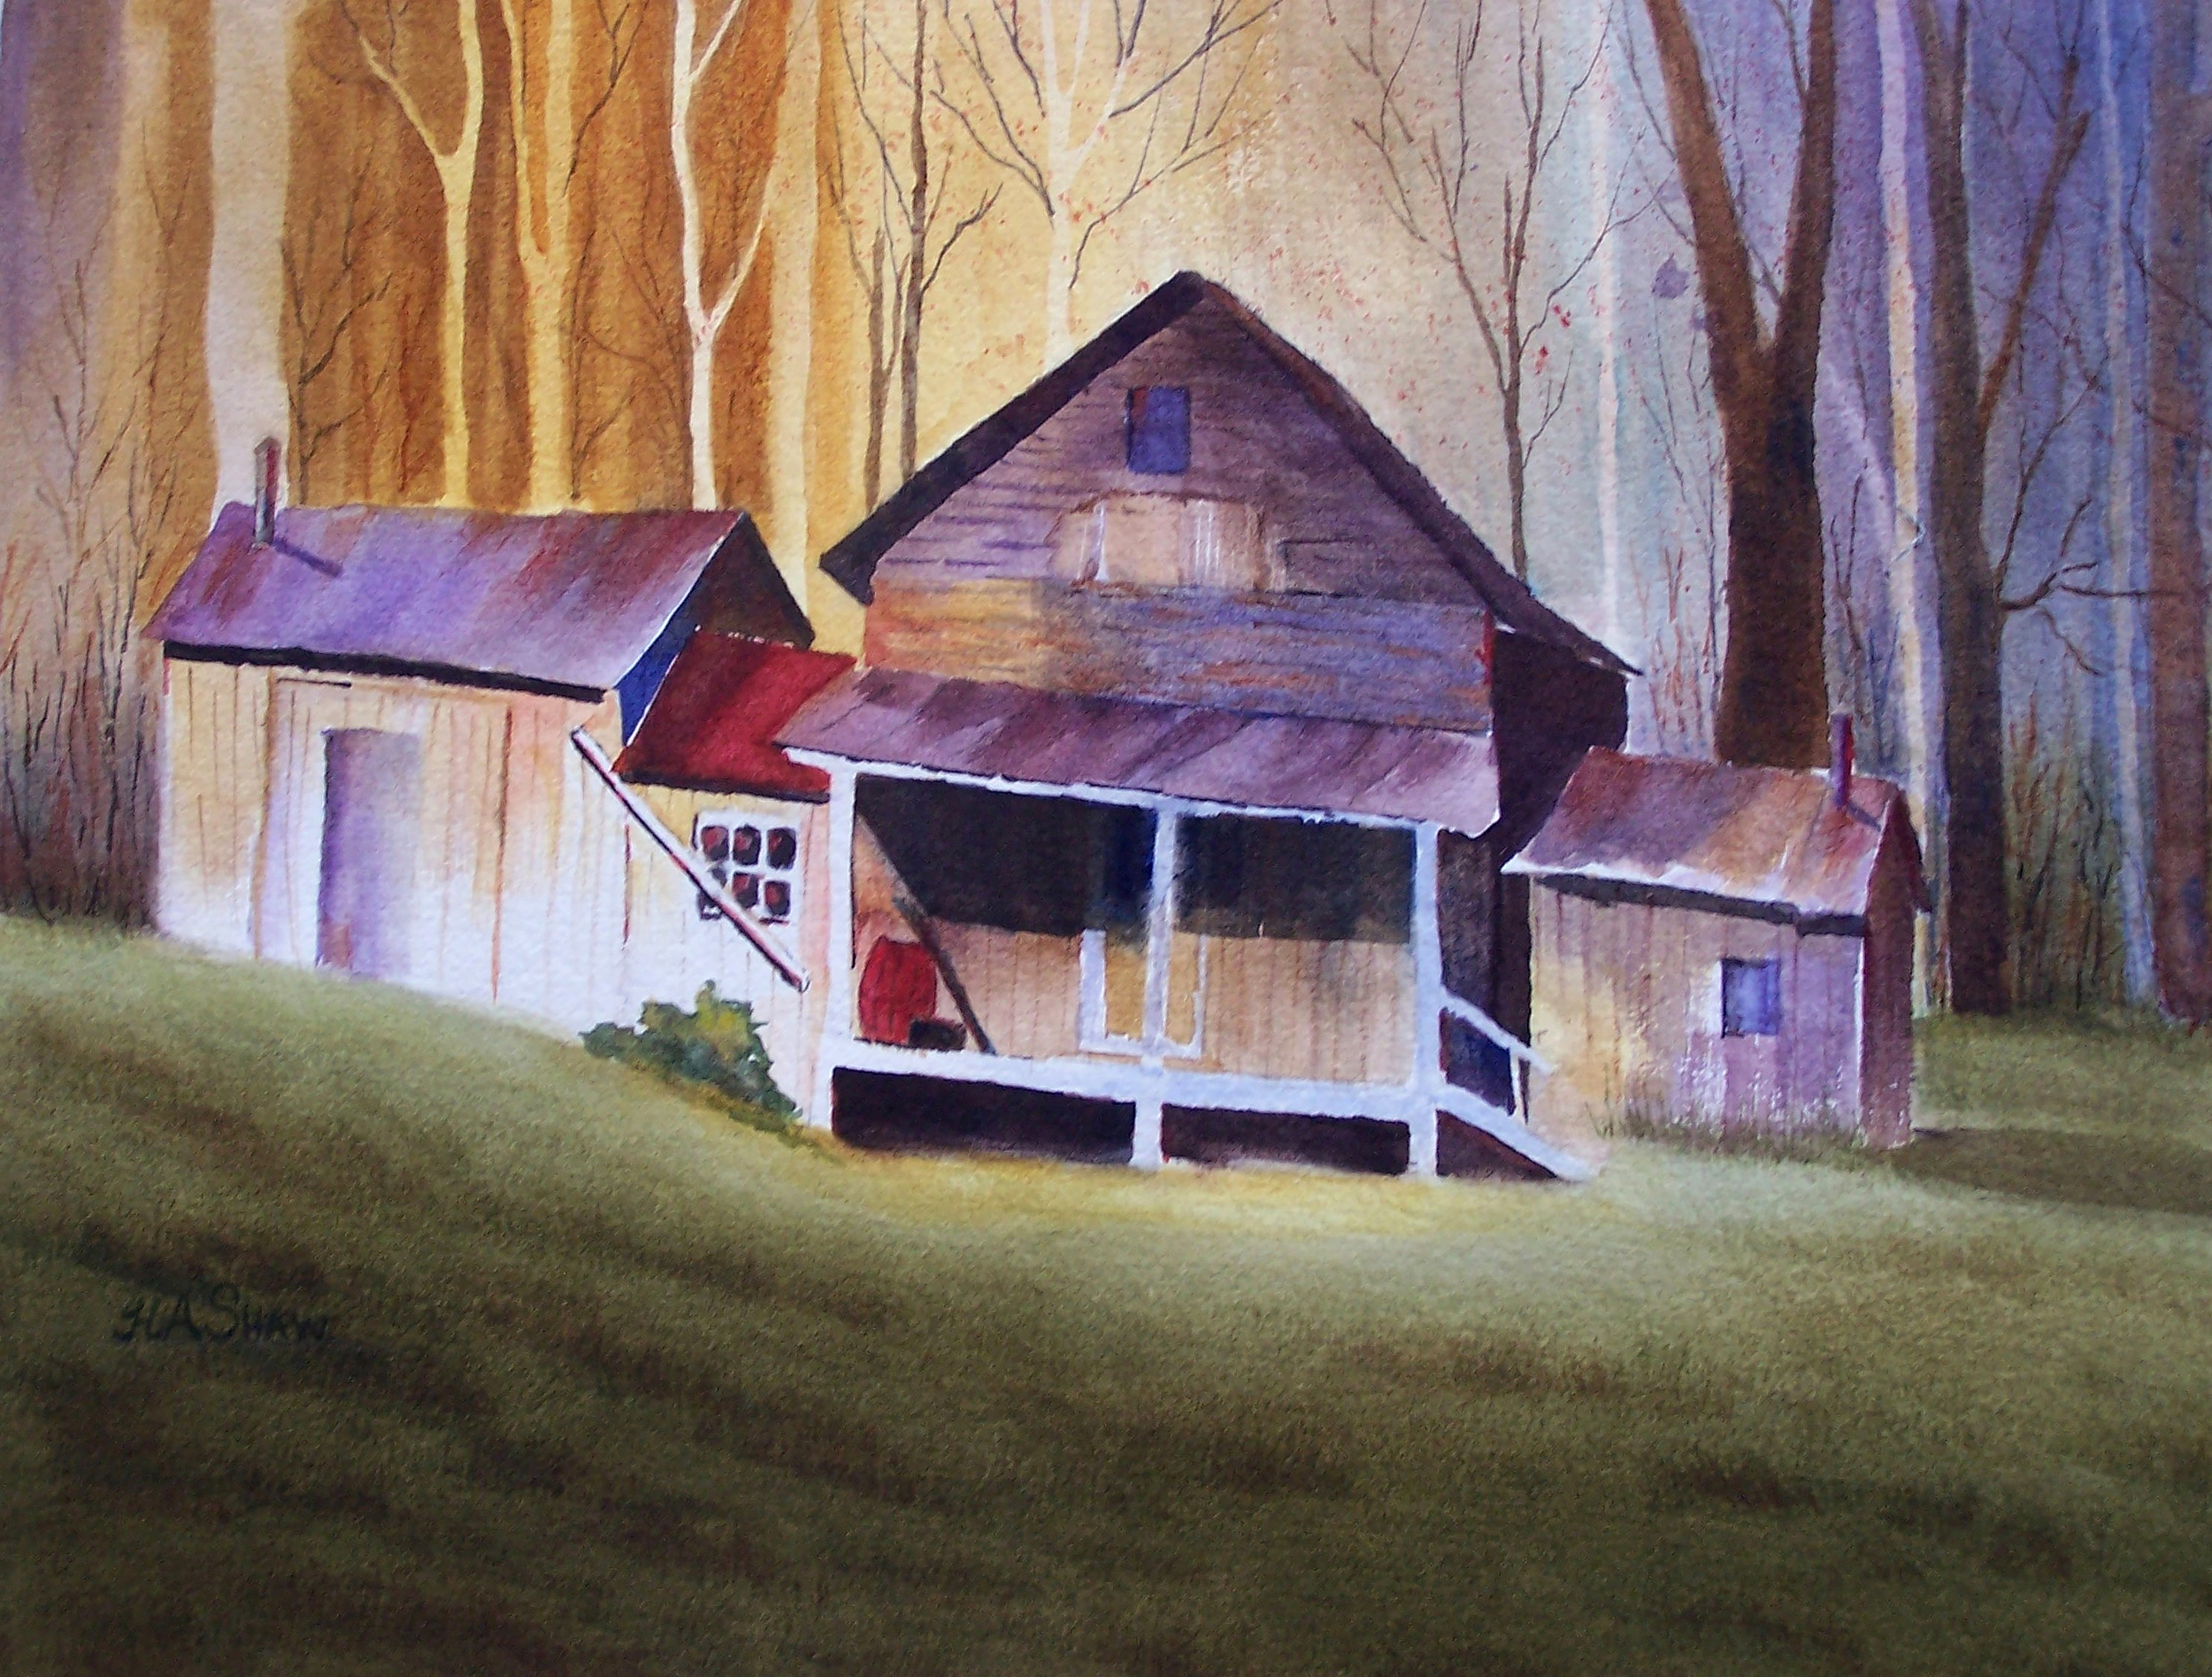 6202_Patrick County Farmhouse_11x14.JPG